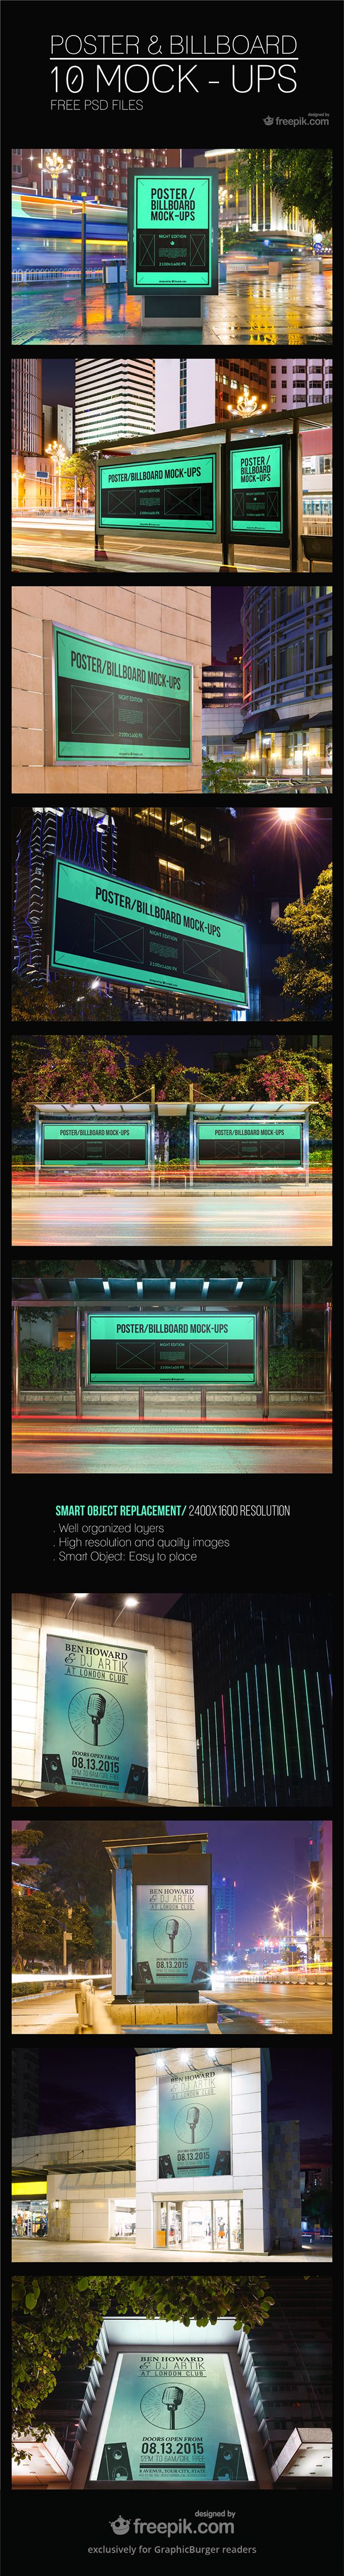 10 Urban Poster/Billboard MockUps | GraphicBurger